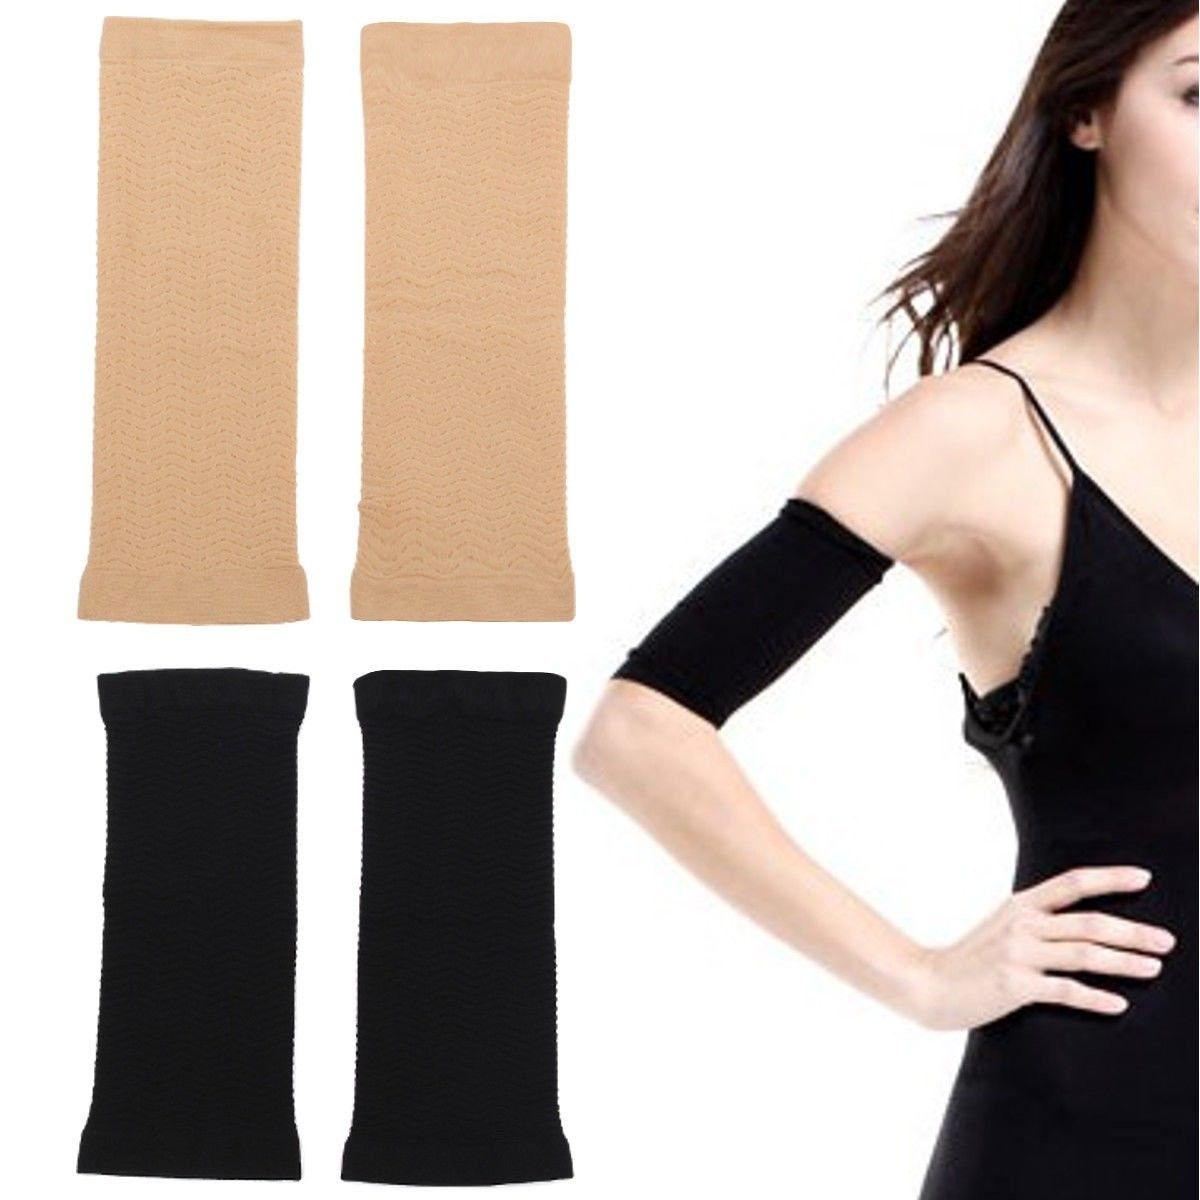 Arm Shaper - Shapewear - Arm Slimmer - Arm Control Shapewear - Beige - CG180C4OKGW - Sports & Fitnes...